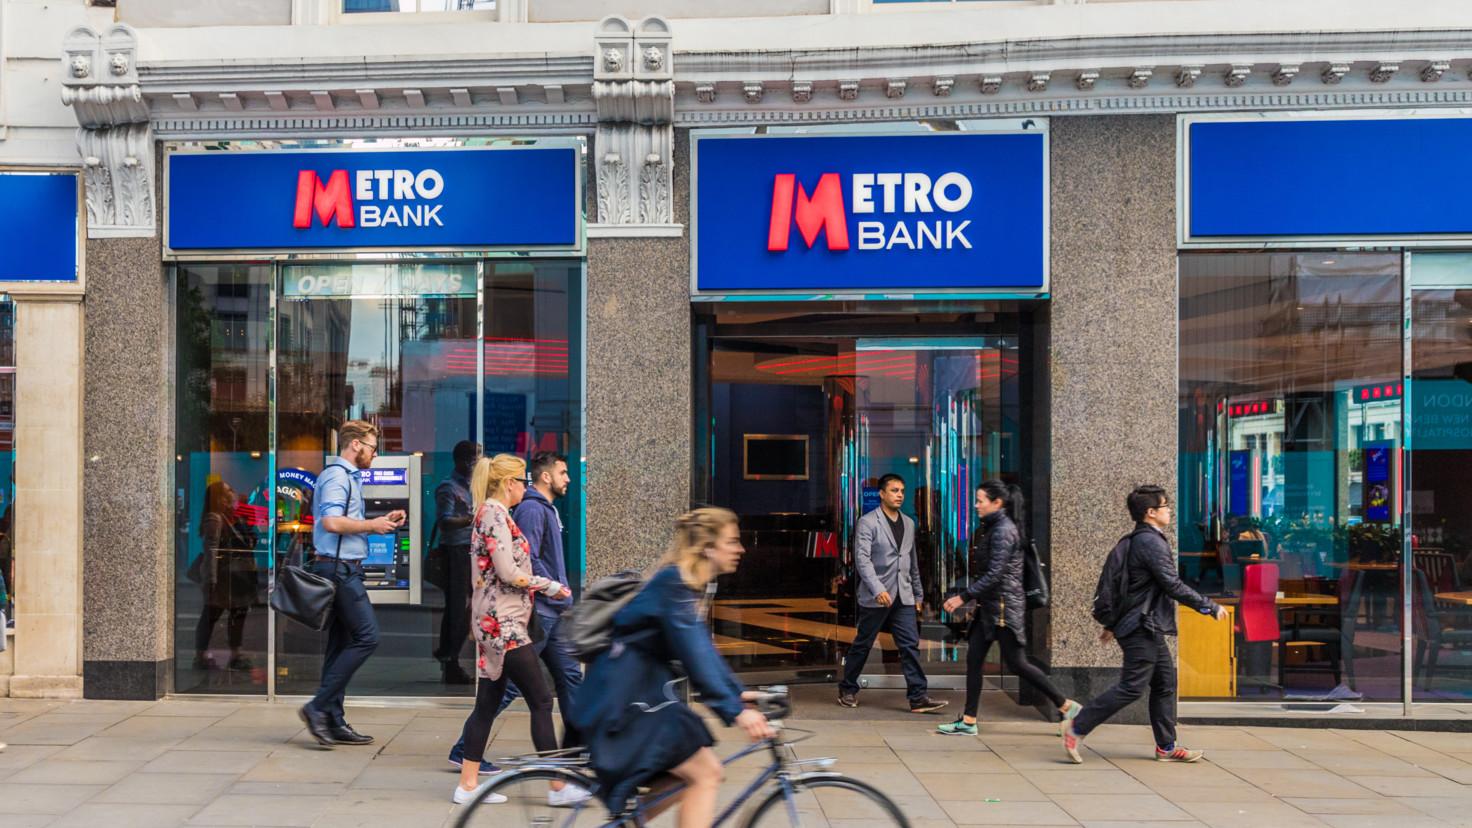 Metro Bank reports pre-tax loss of 131m